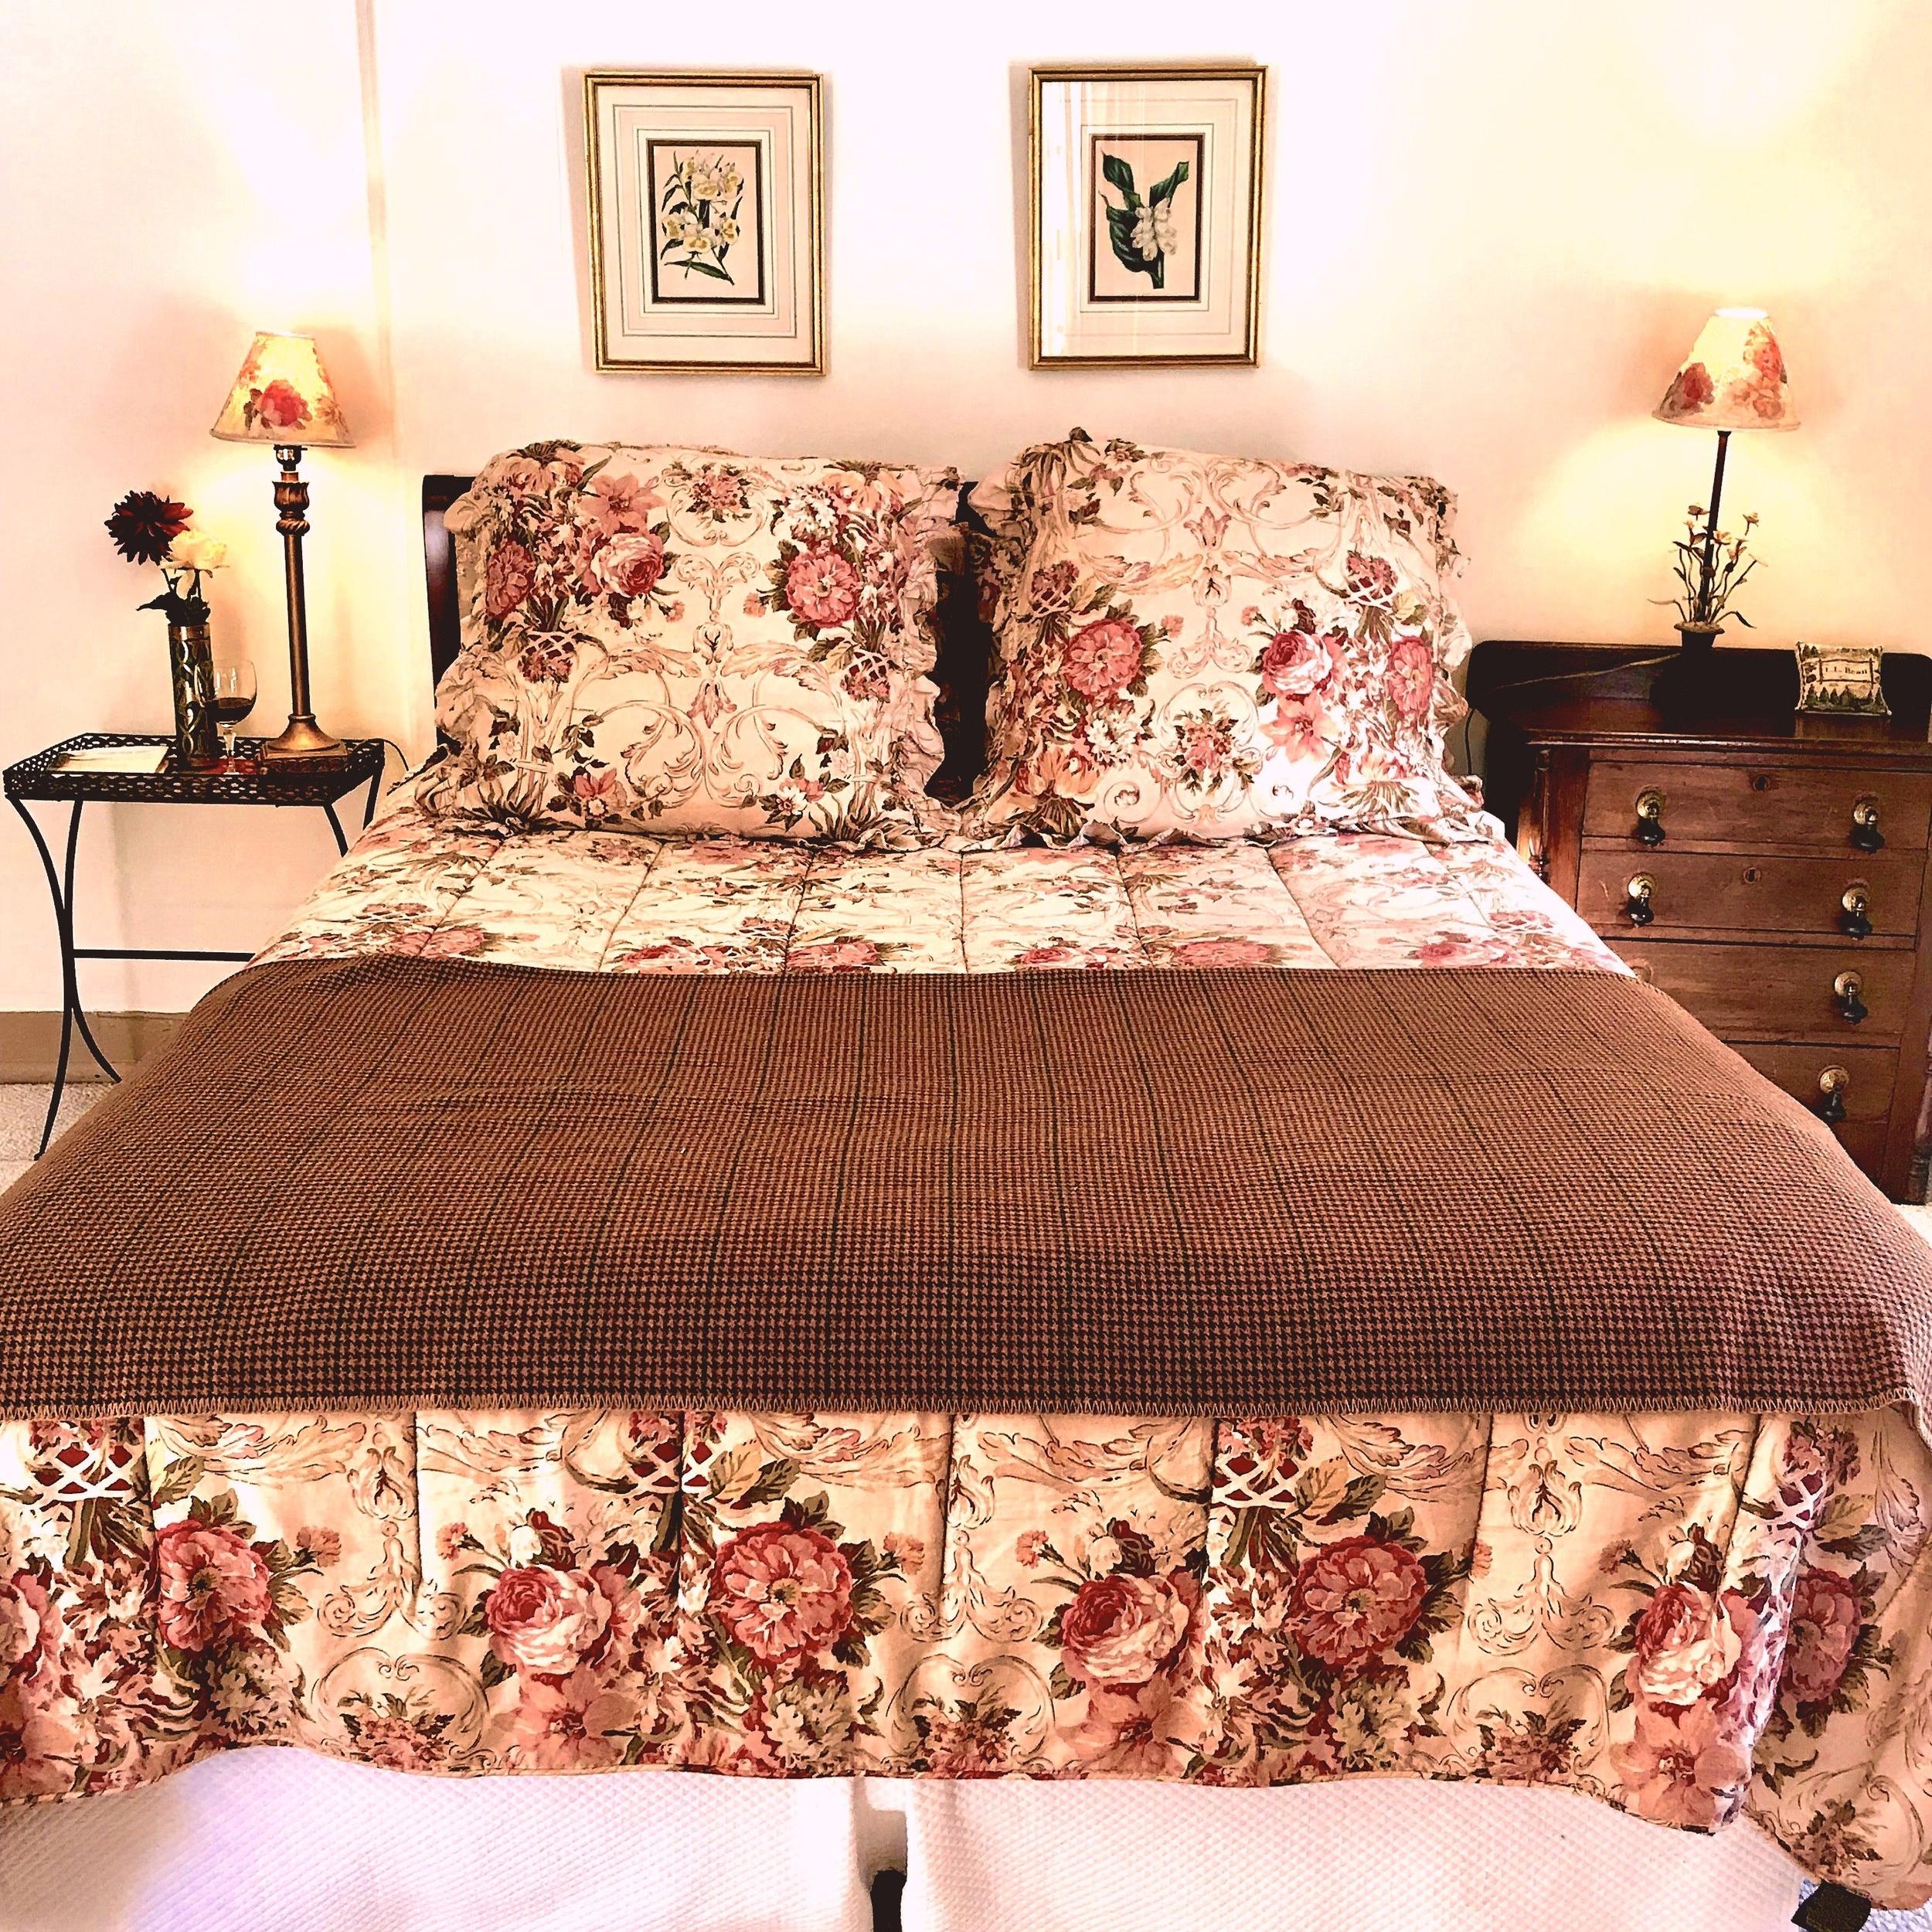 Room 3 bed.JPG